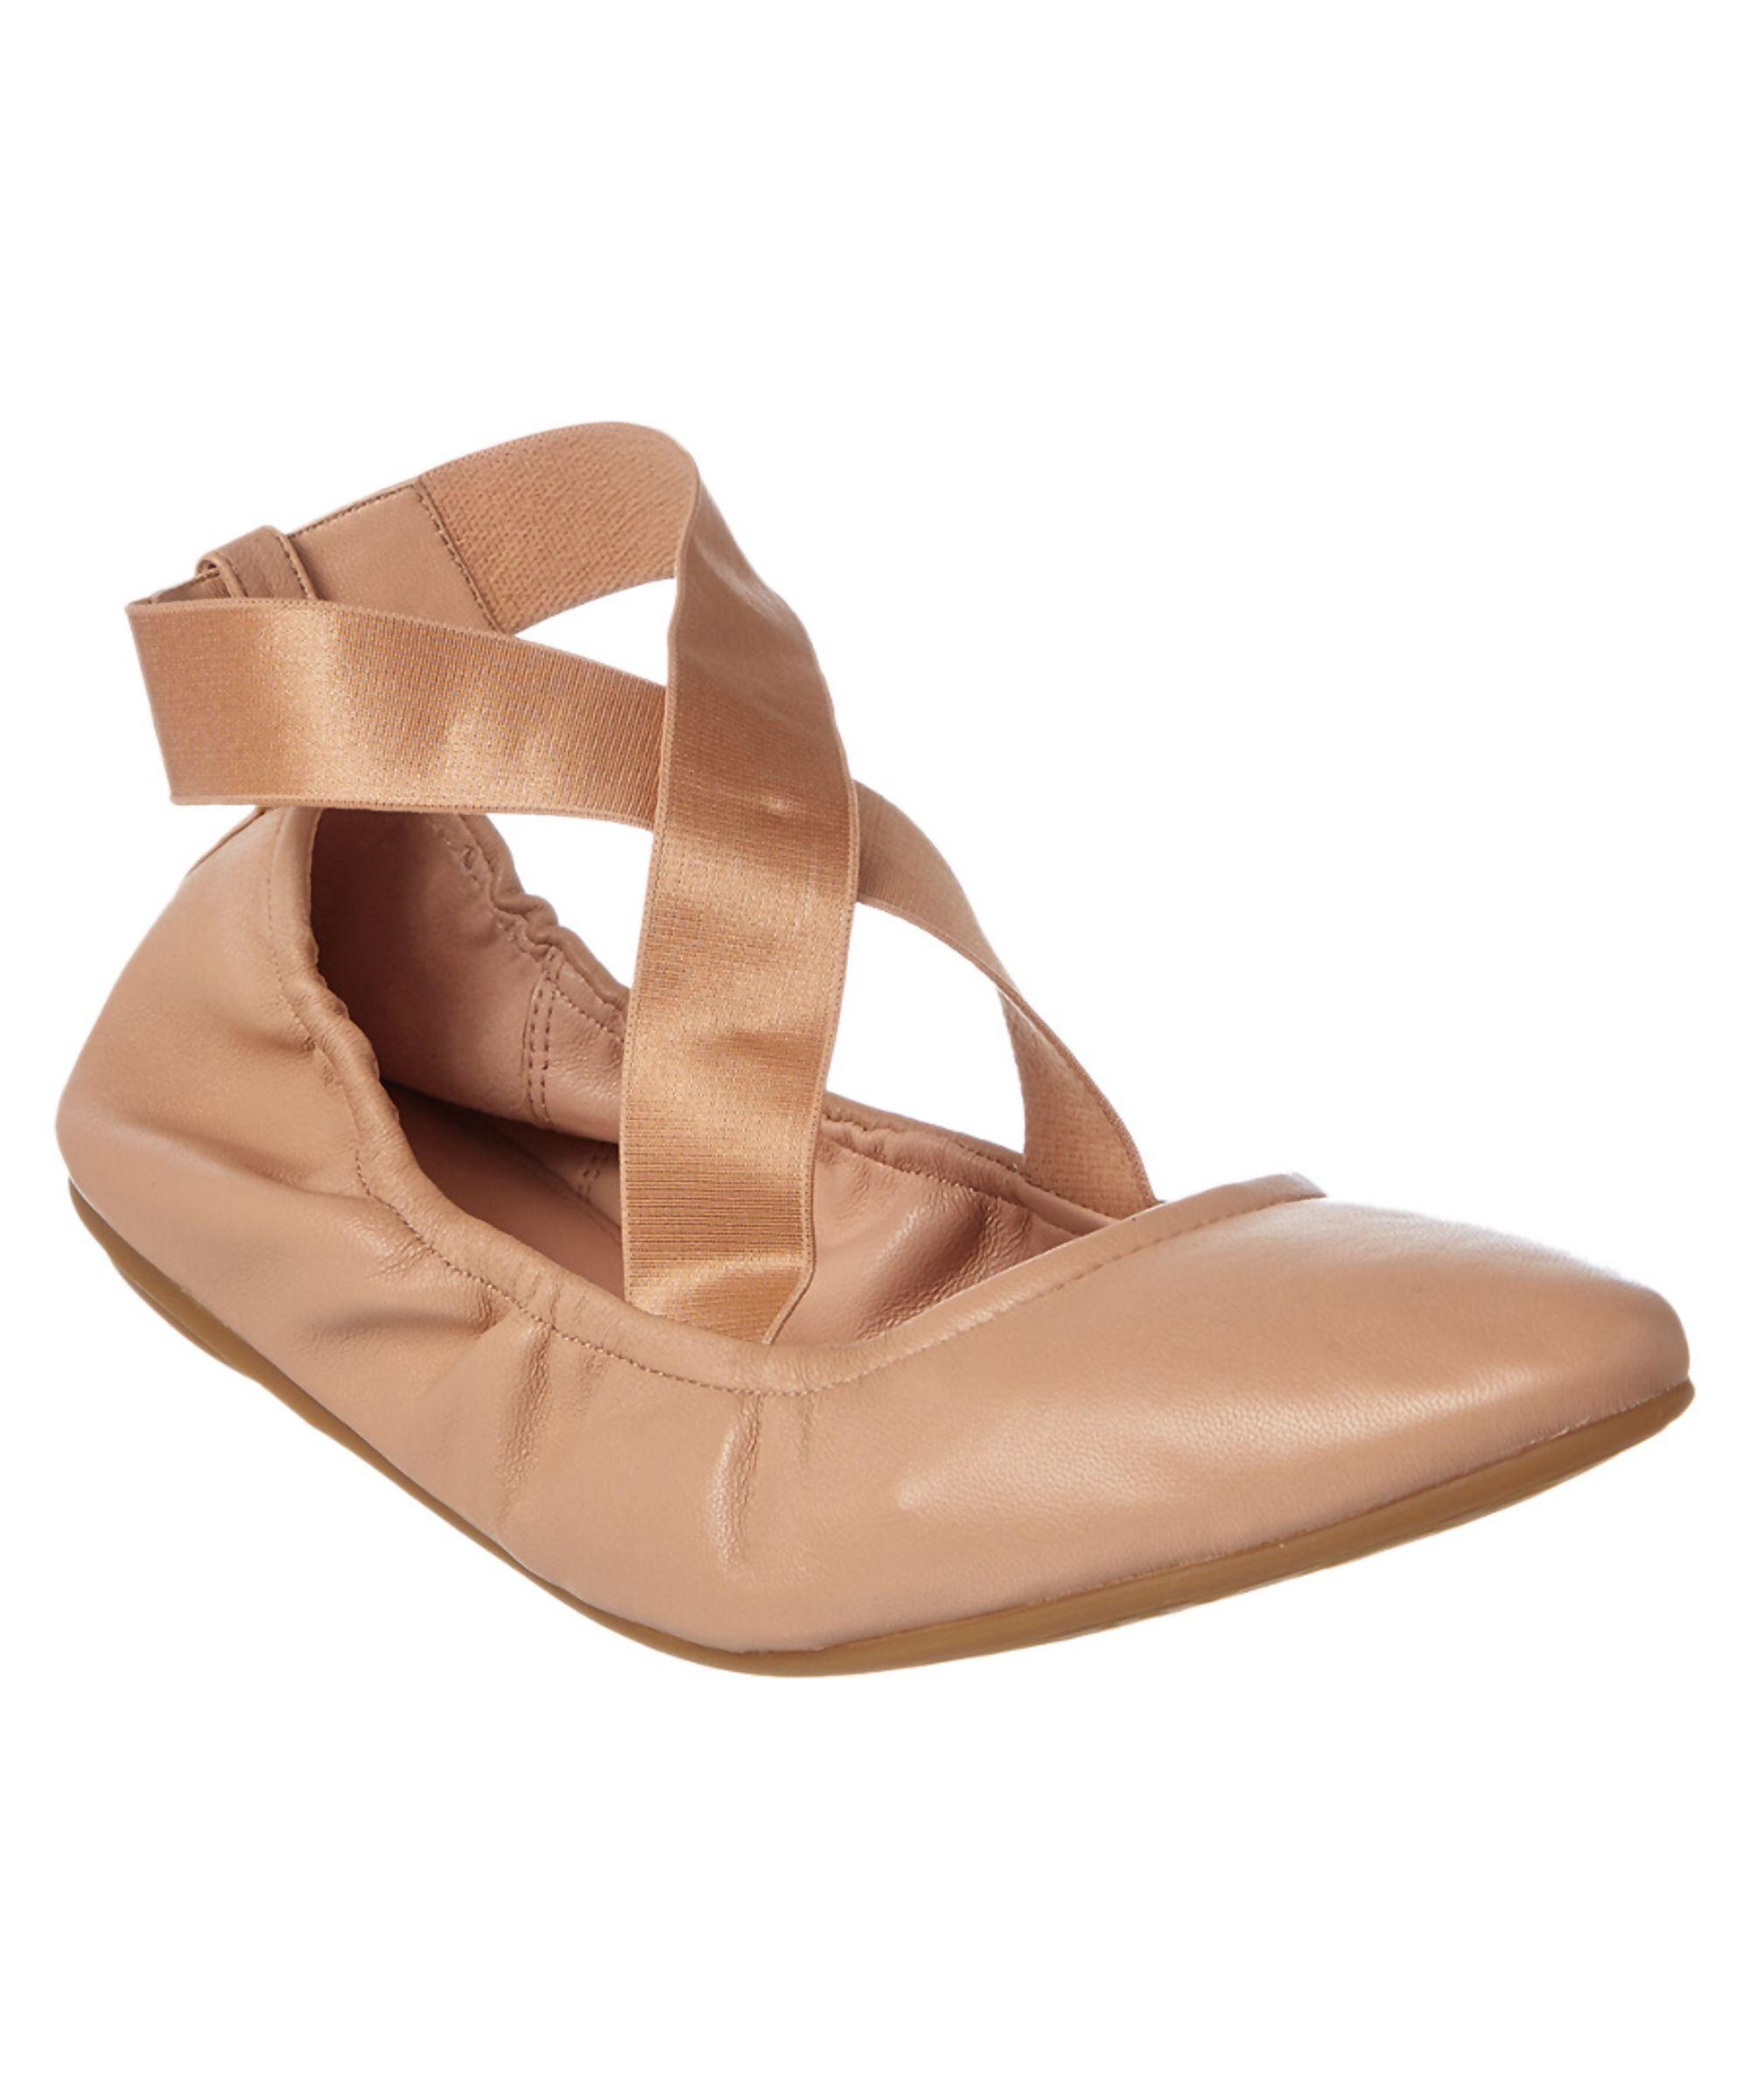 TARYN ROSE | Taryn Rose Edina Leather Flat #Shoes #Flats #TARYN ROSE